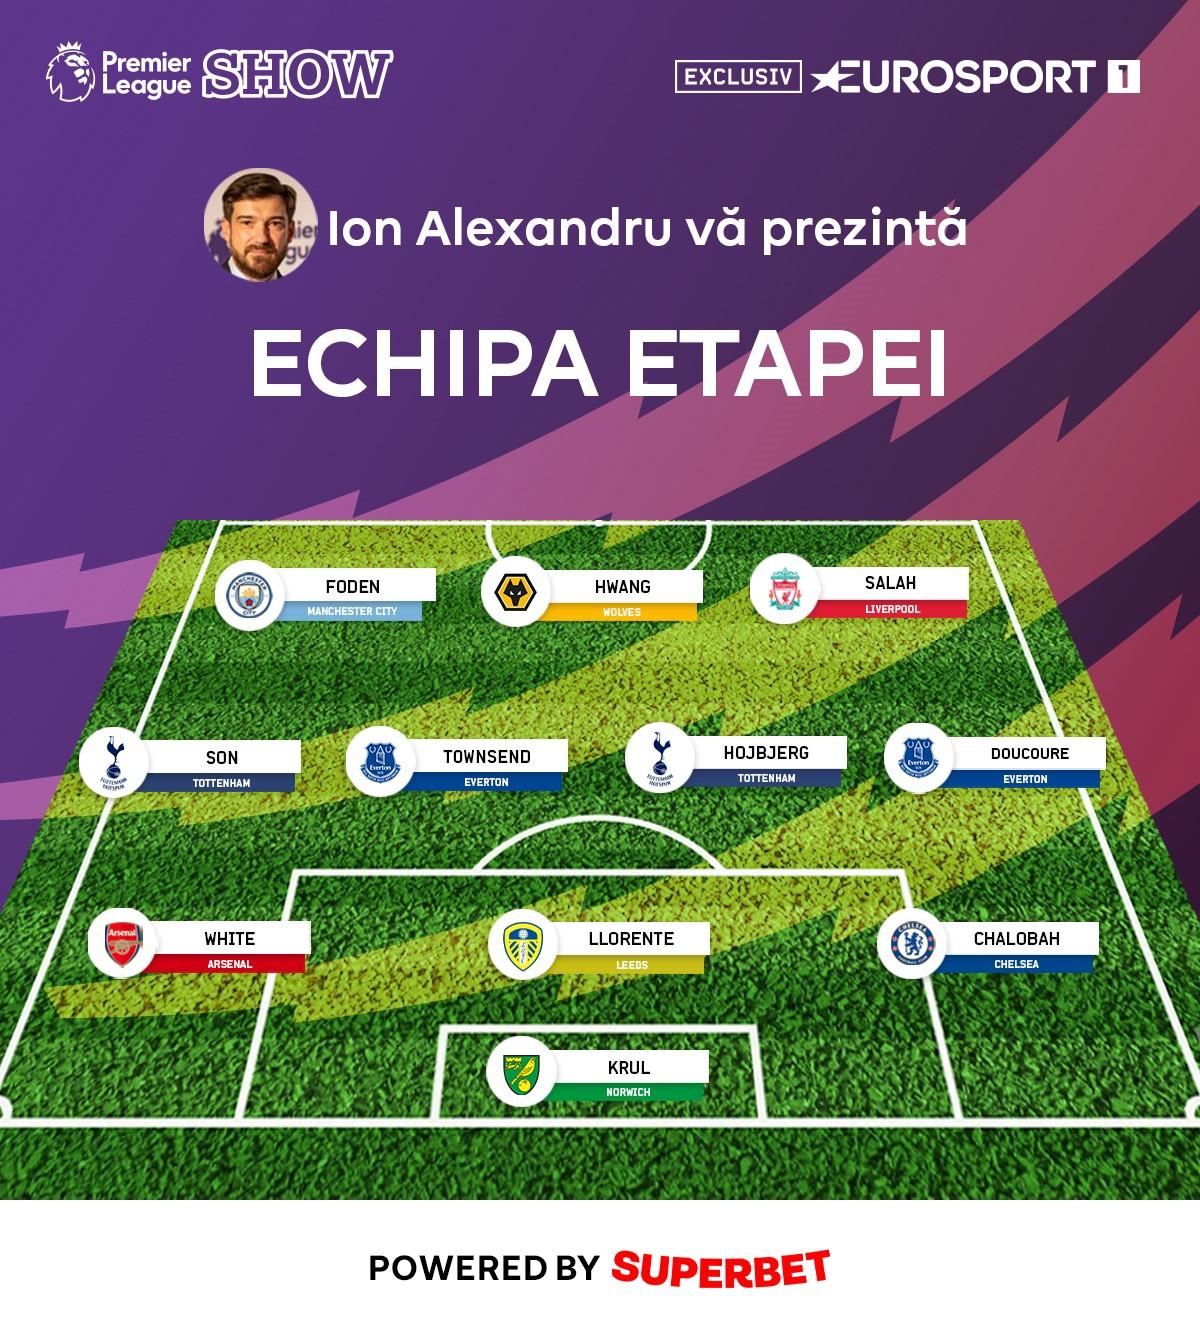 https://i.eurosport.com/2021/10/03/3231254.jpg